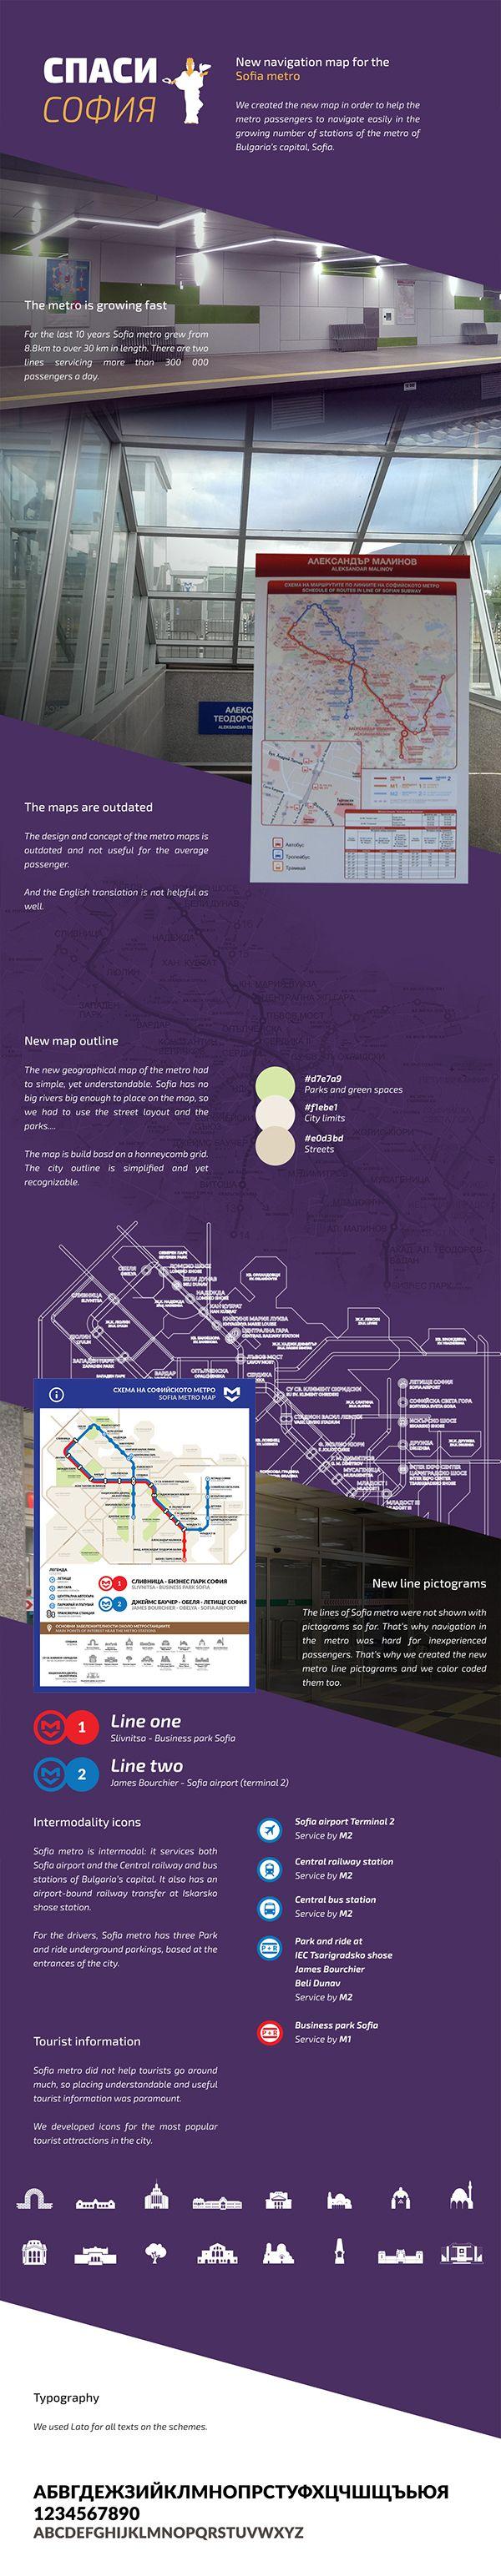 New navigation map for Sofia metro